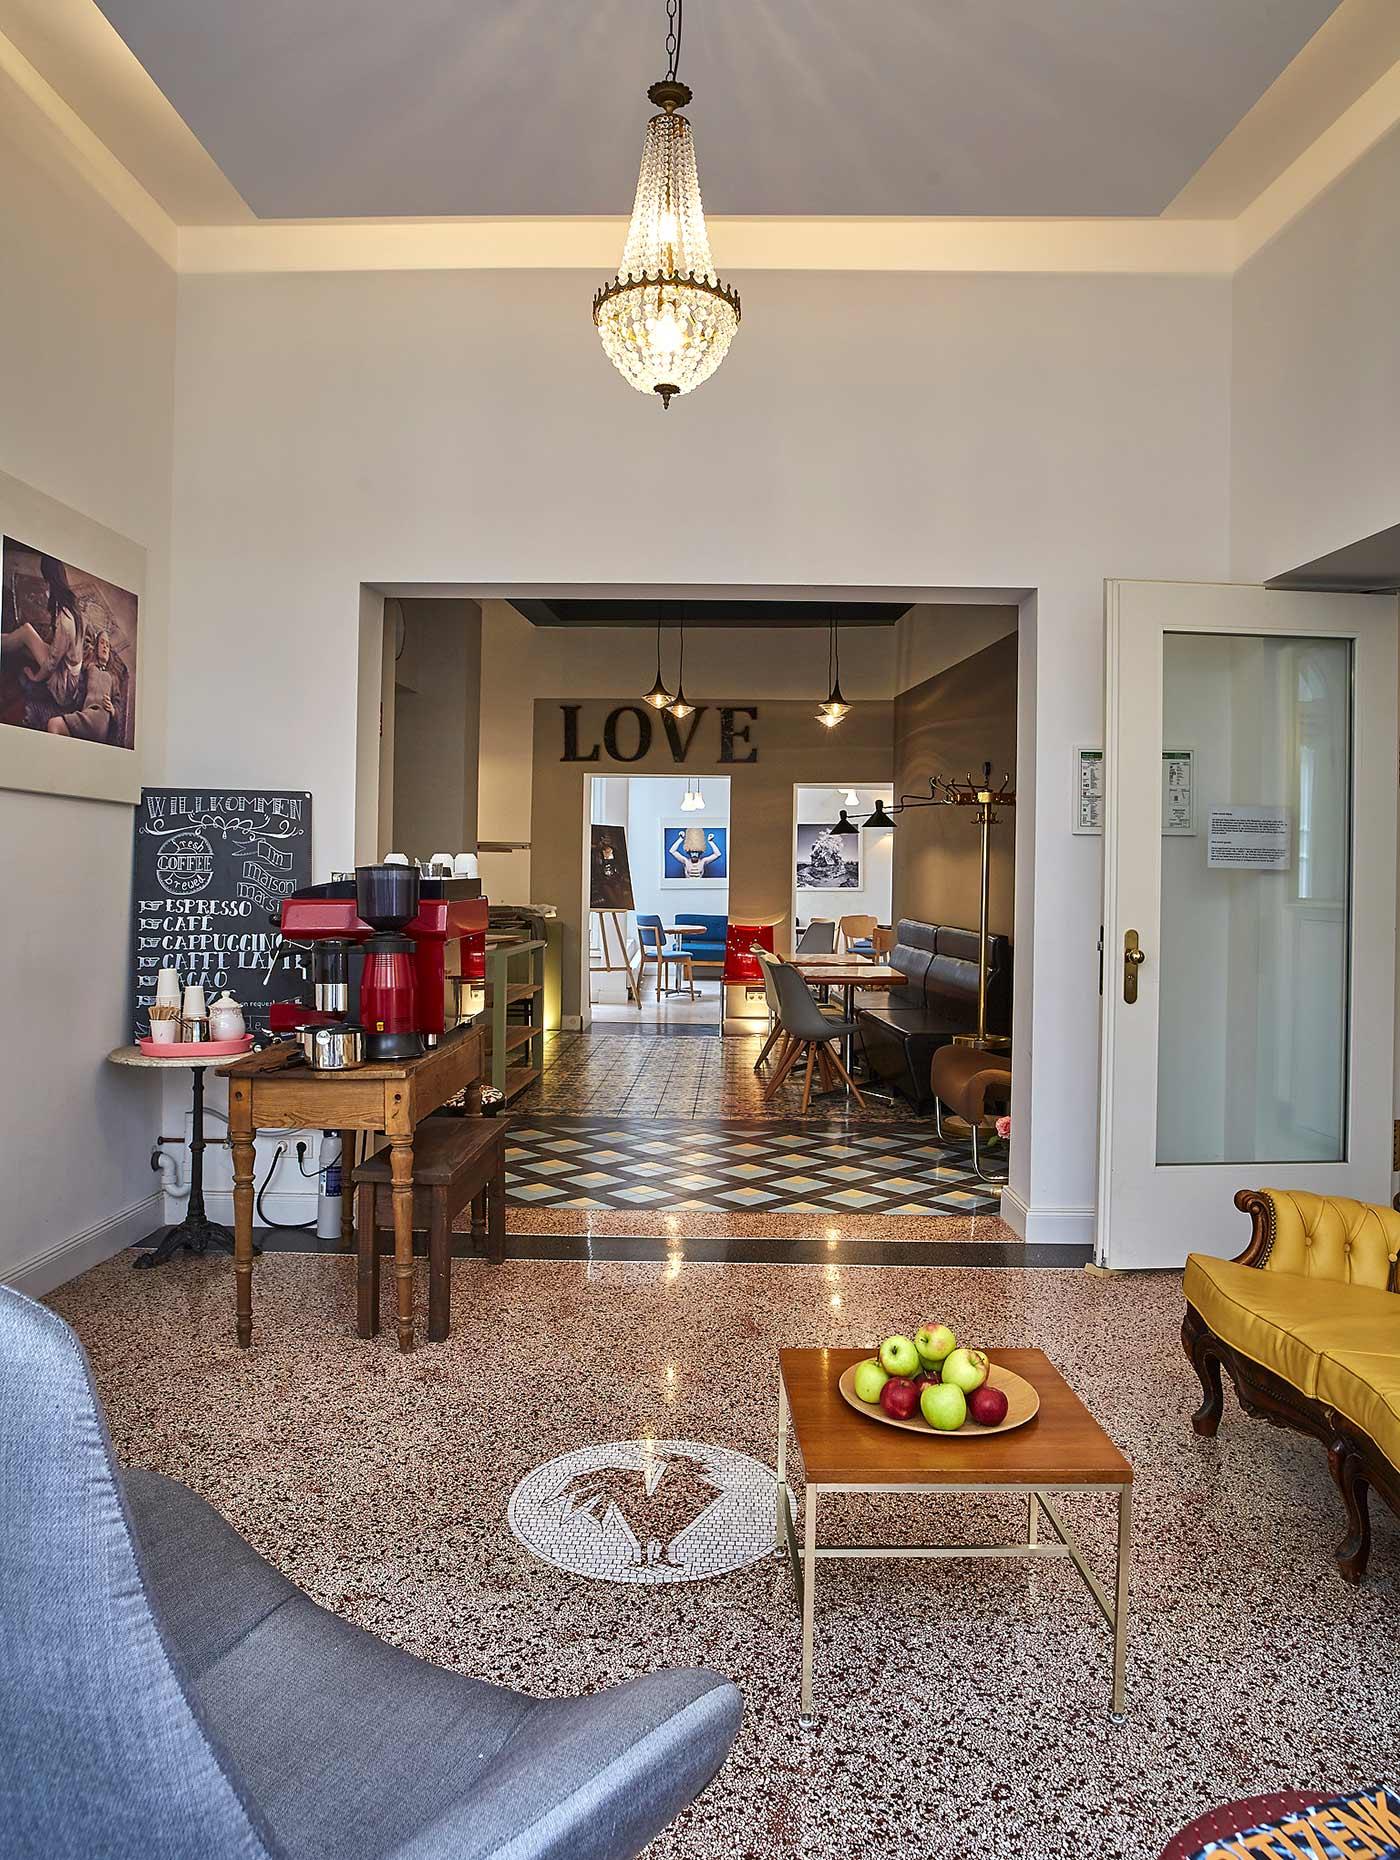 marsil hotel im herzen k lns. Black Bedroom Furniture Sets. Home Design Ideas